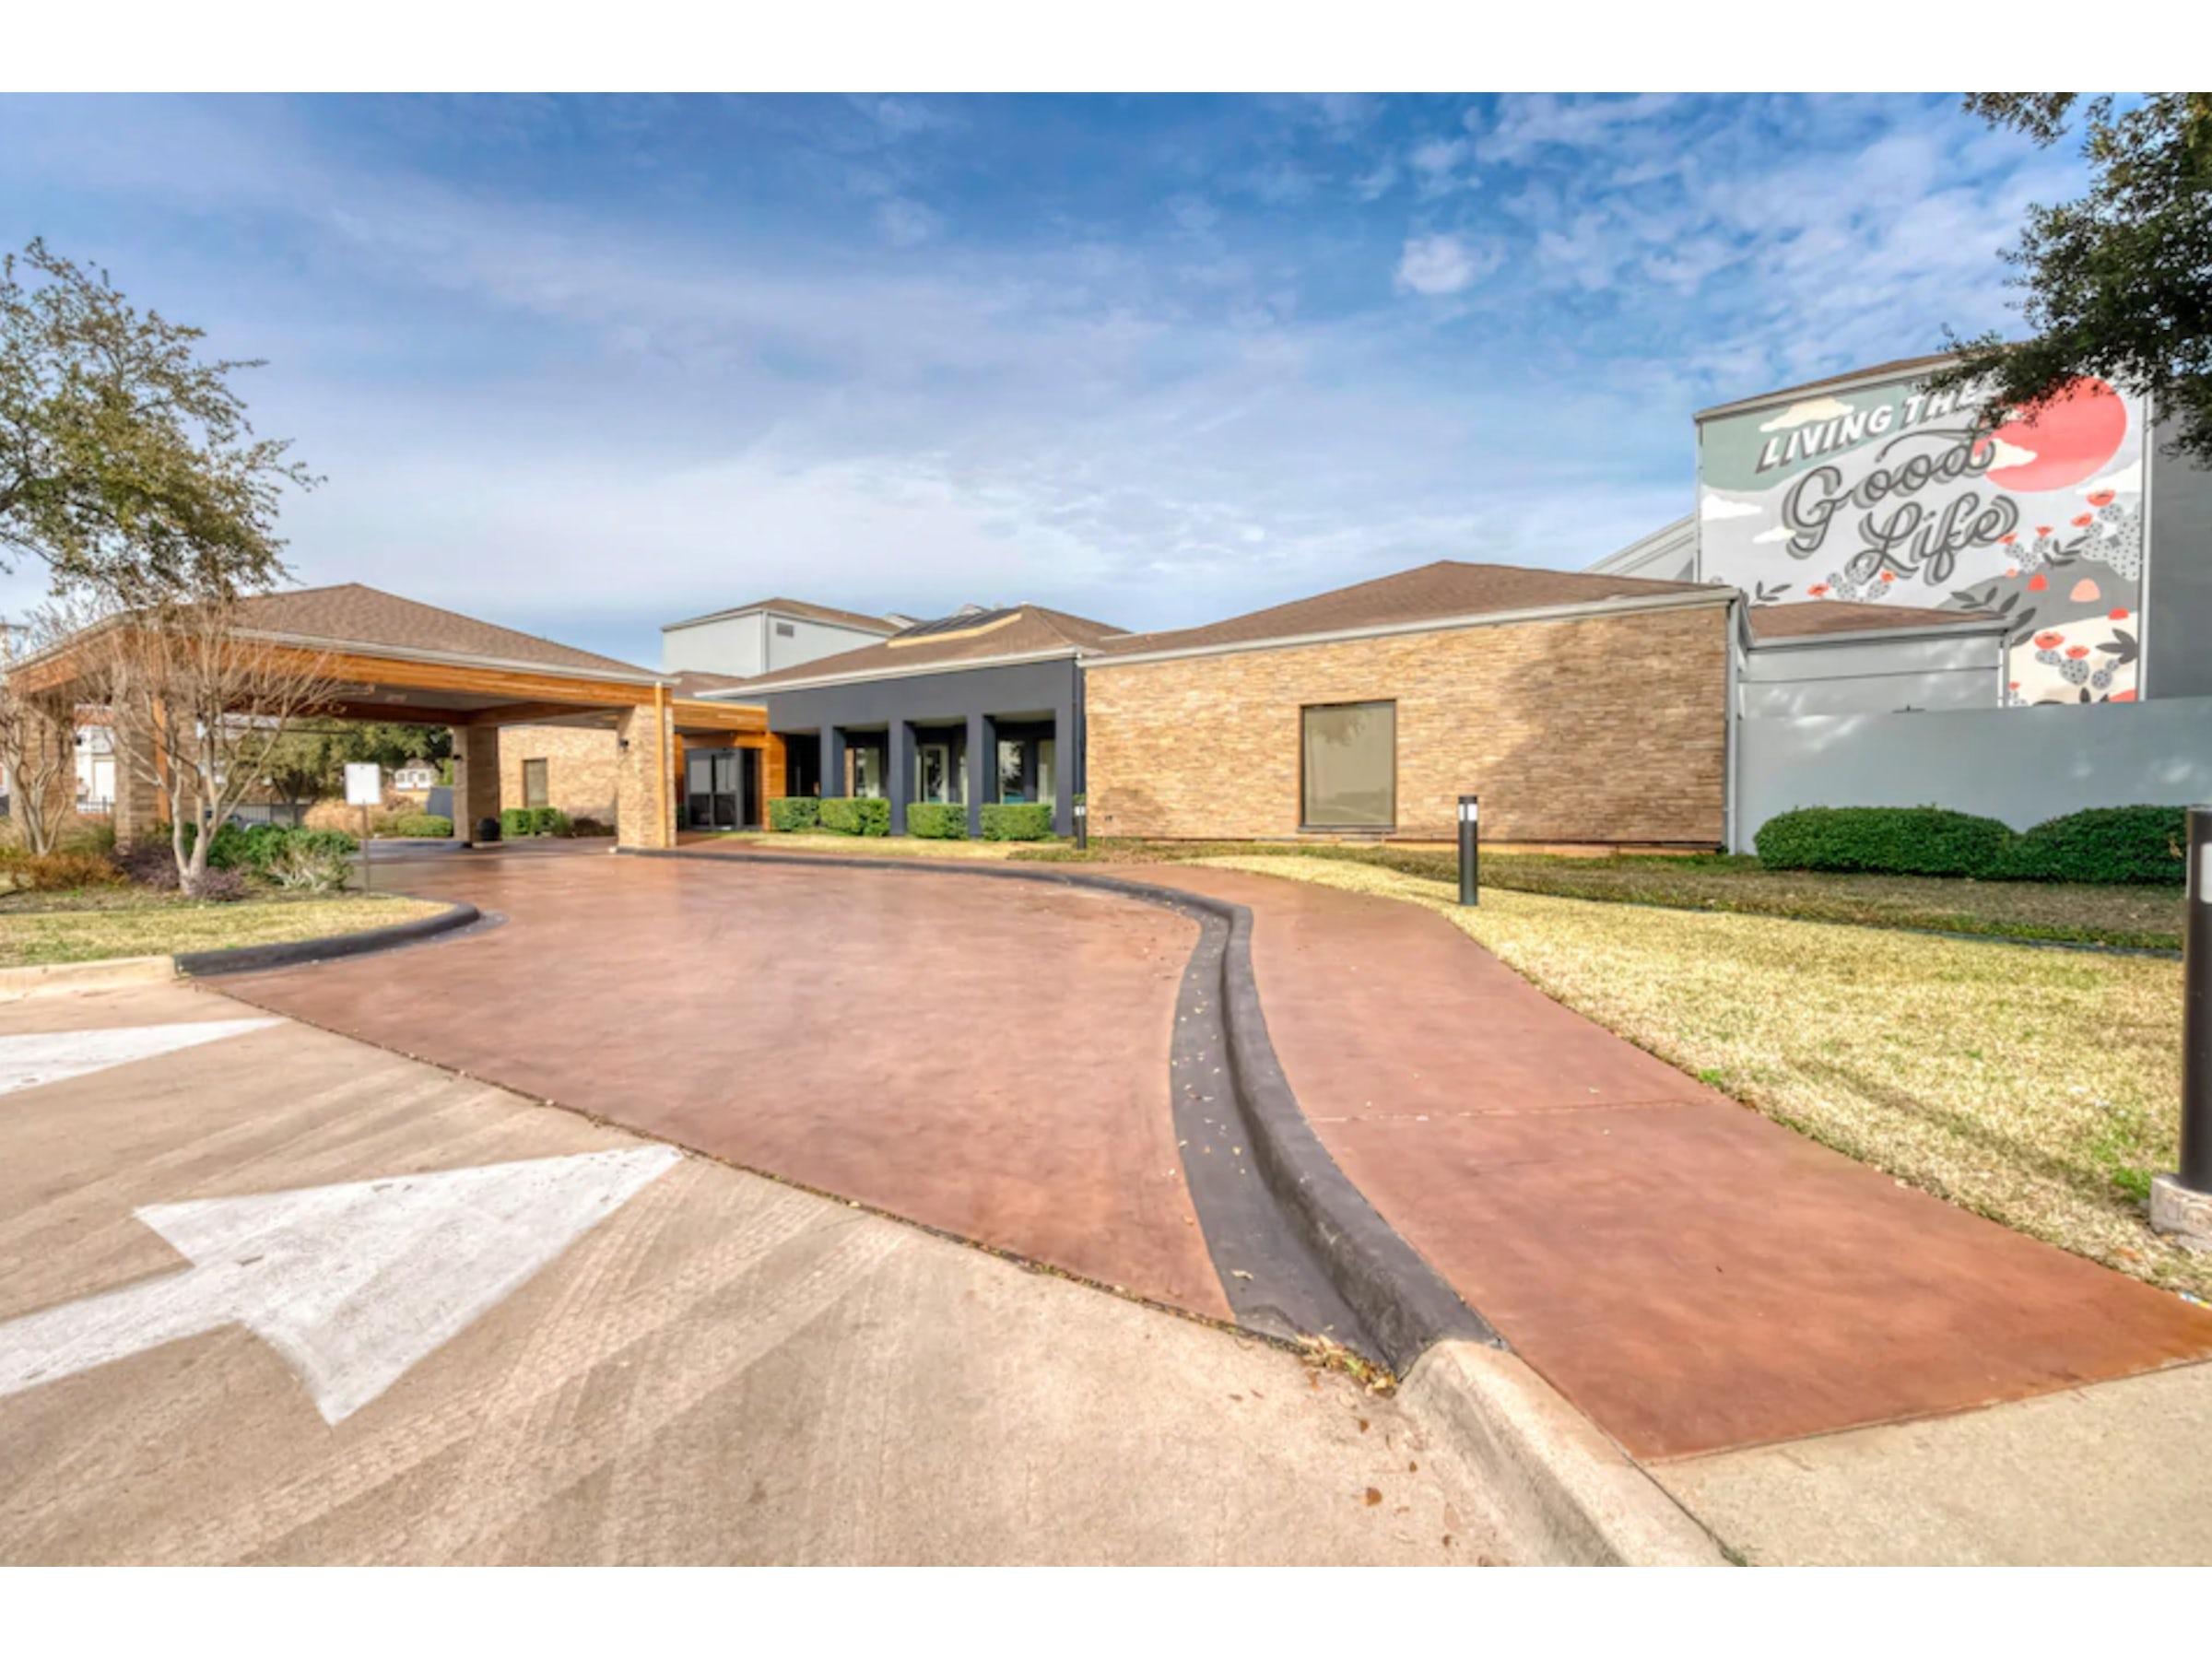 OYO Townhouse Dallas - Love Field Airport in Beyond Dallas